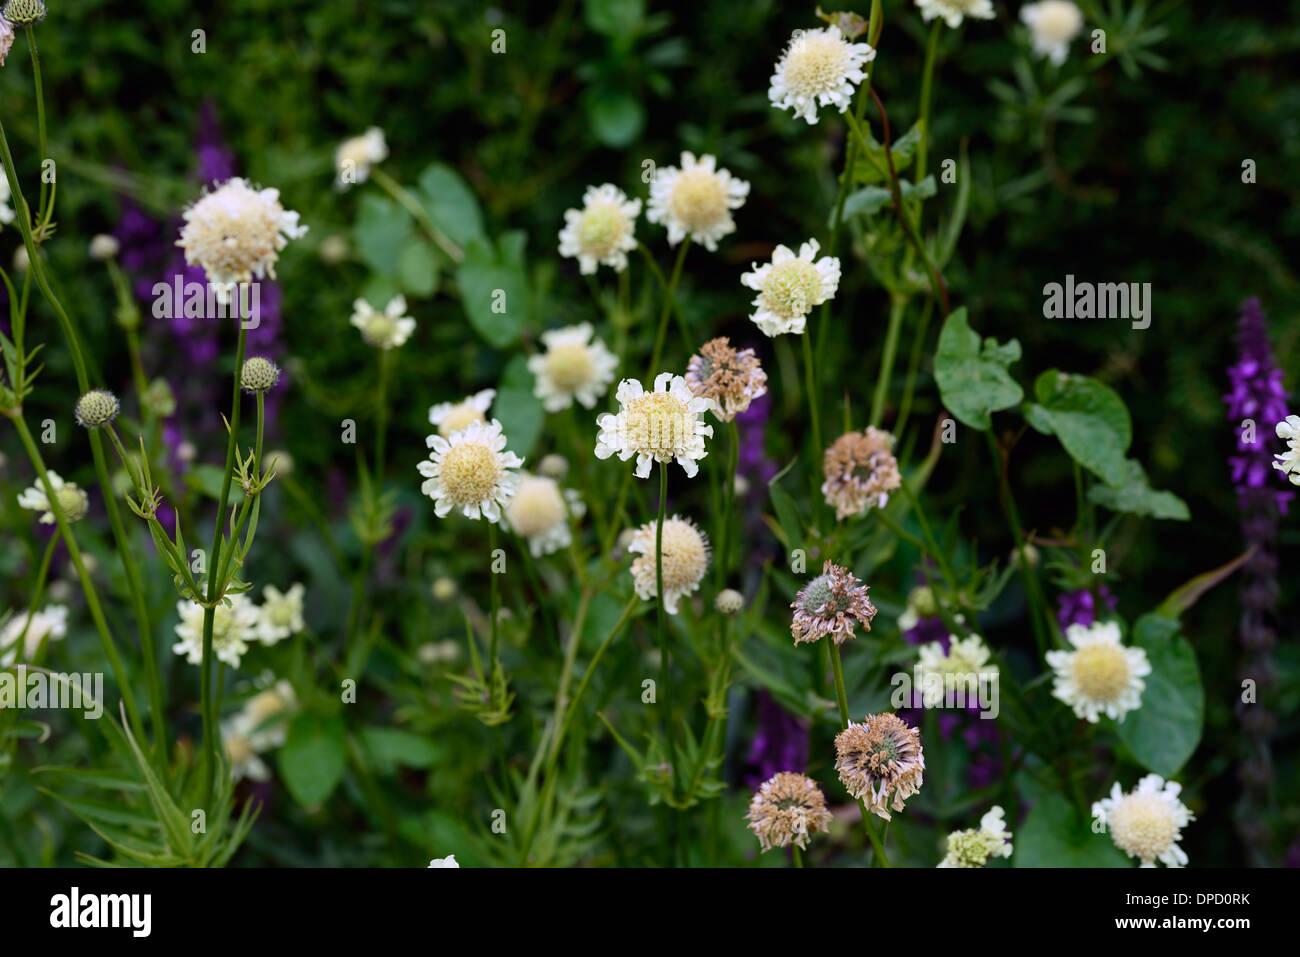 Scabiosa Ochroleuca Pincushion Flower Scabiosa Summer Flower Stock